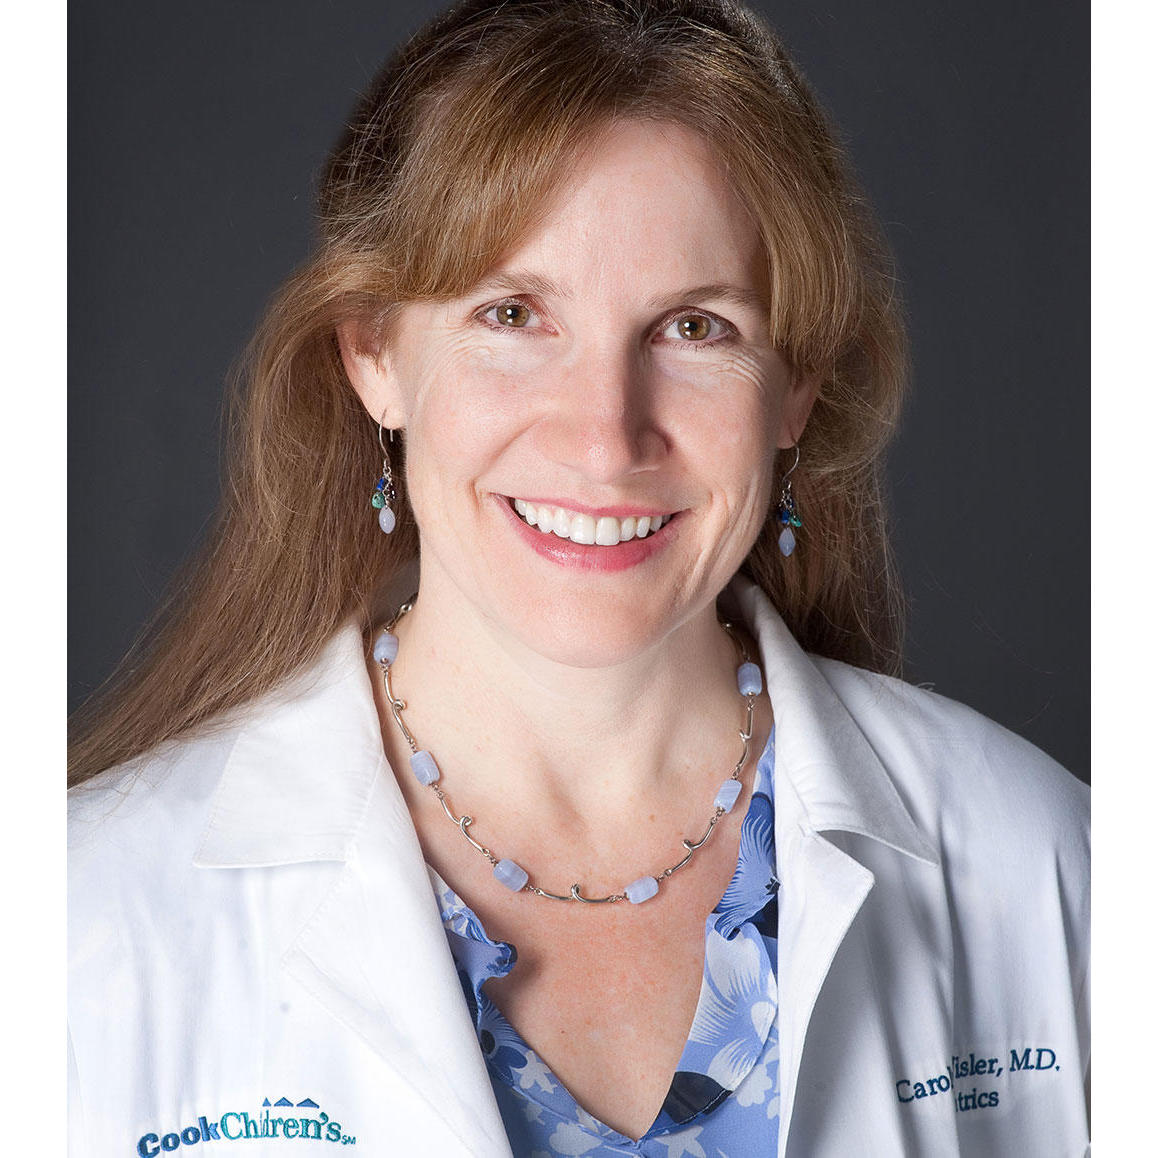 Headshot of Carolyn Wisler